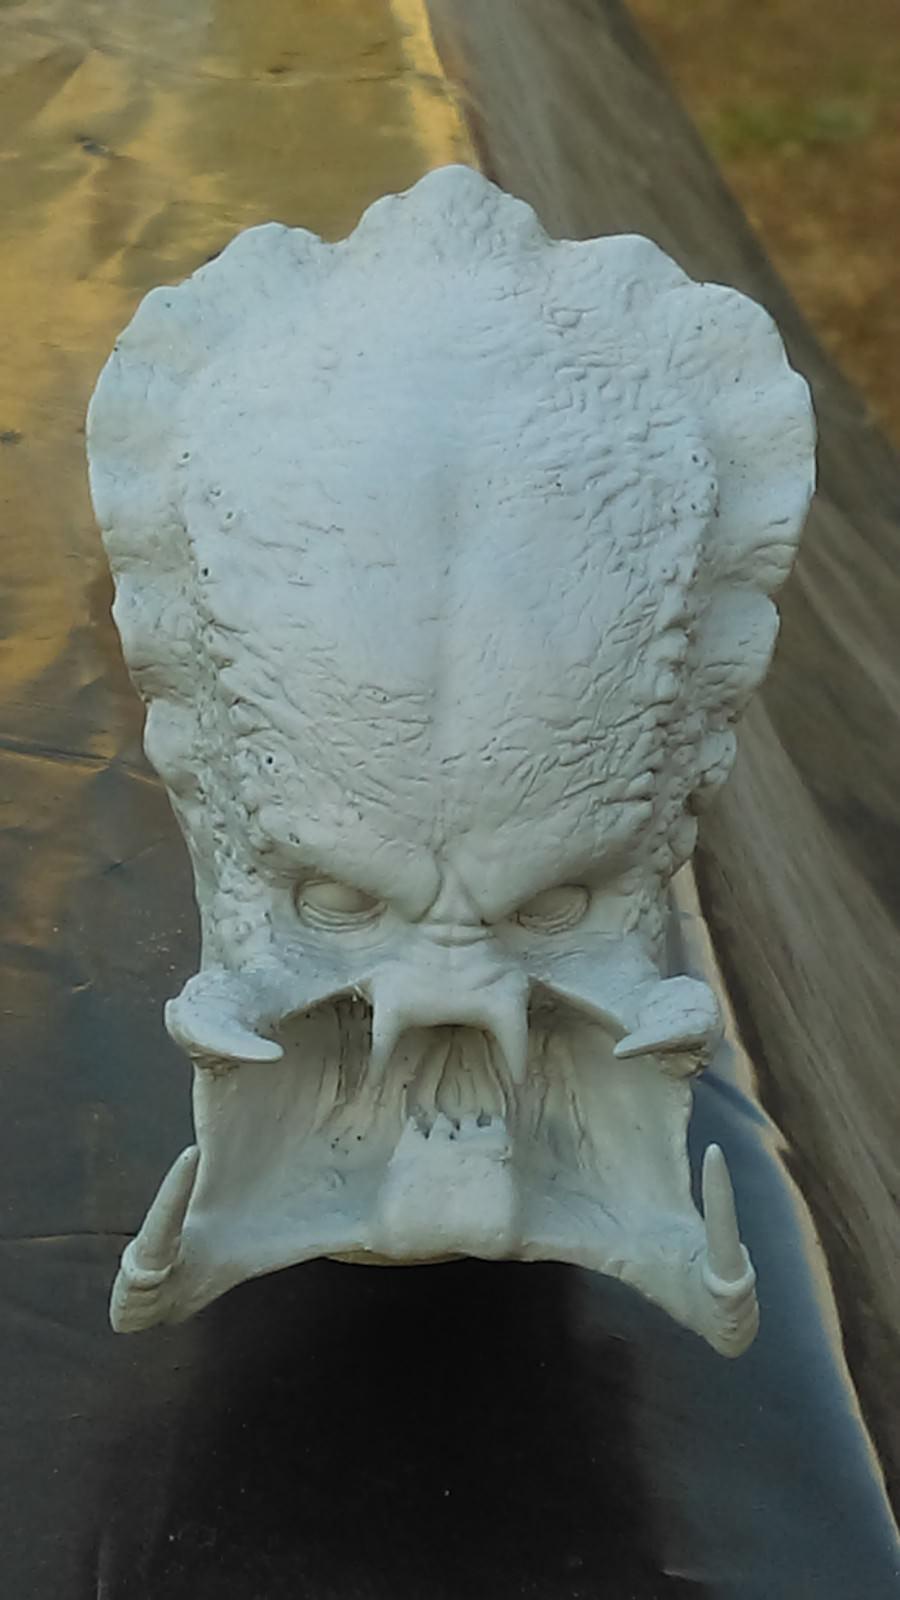 Hot Toys pROTator AVP SCAR CELTIC ANCIENT CHOPPER  custom head resin casting